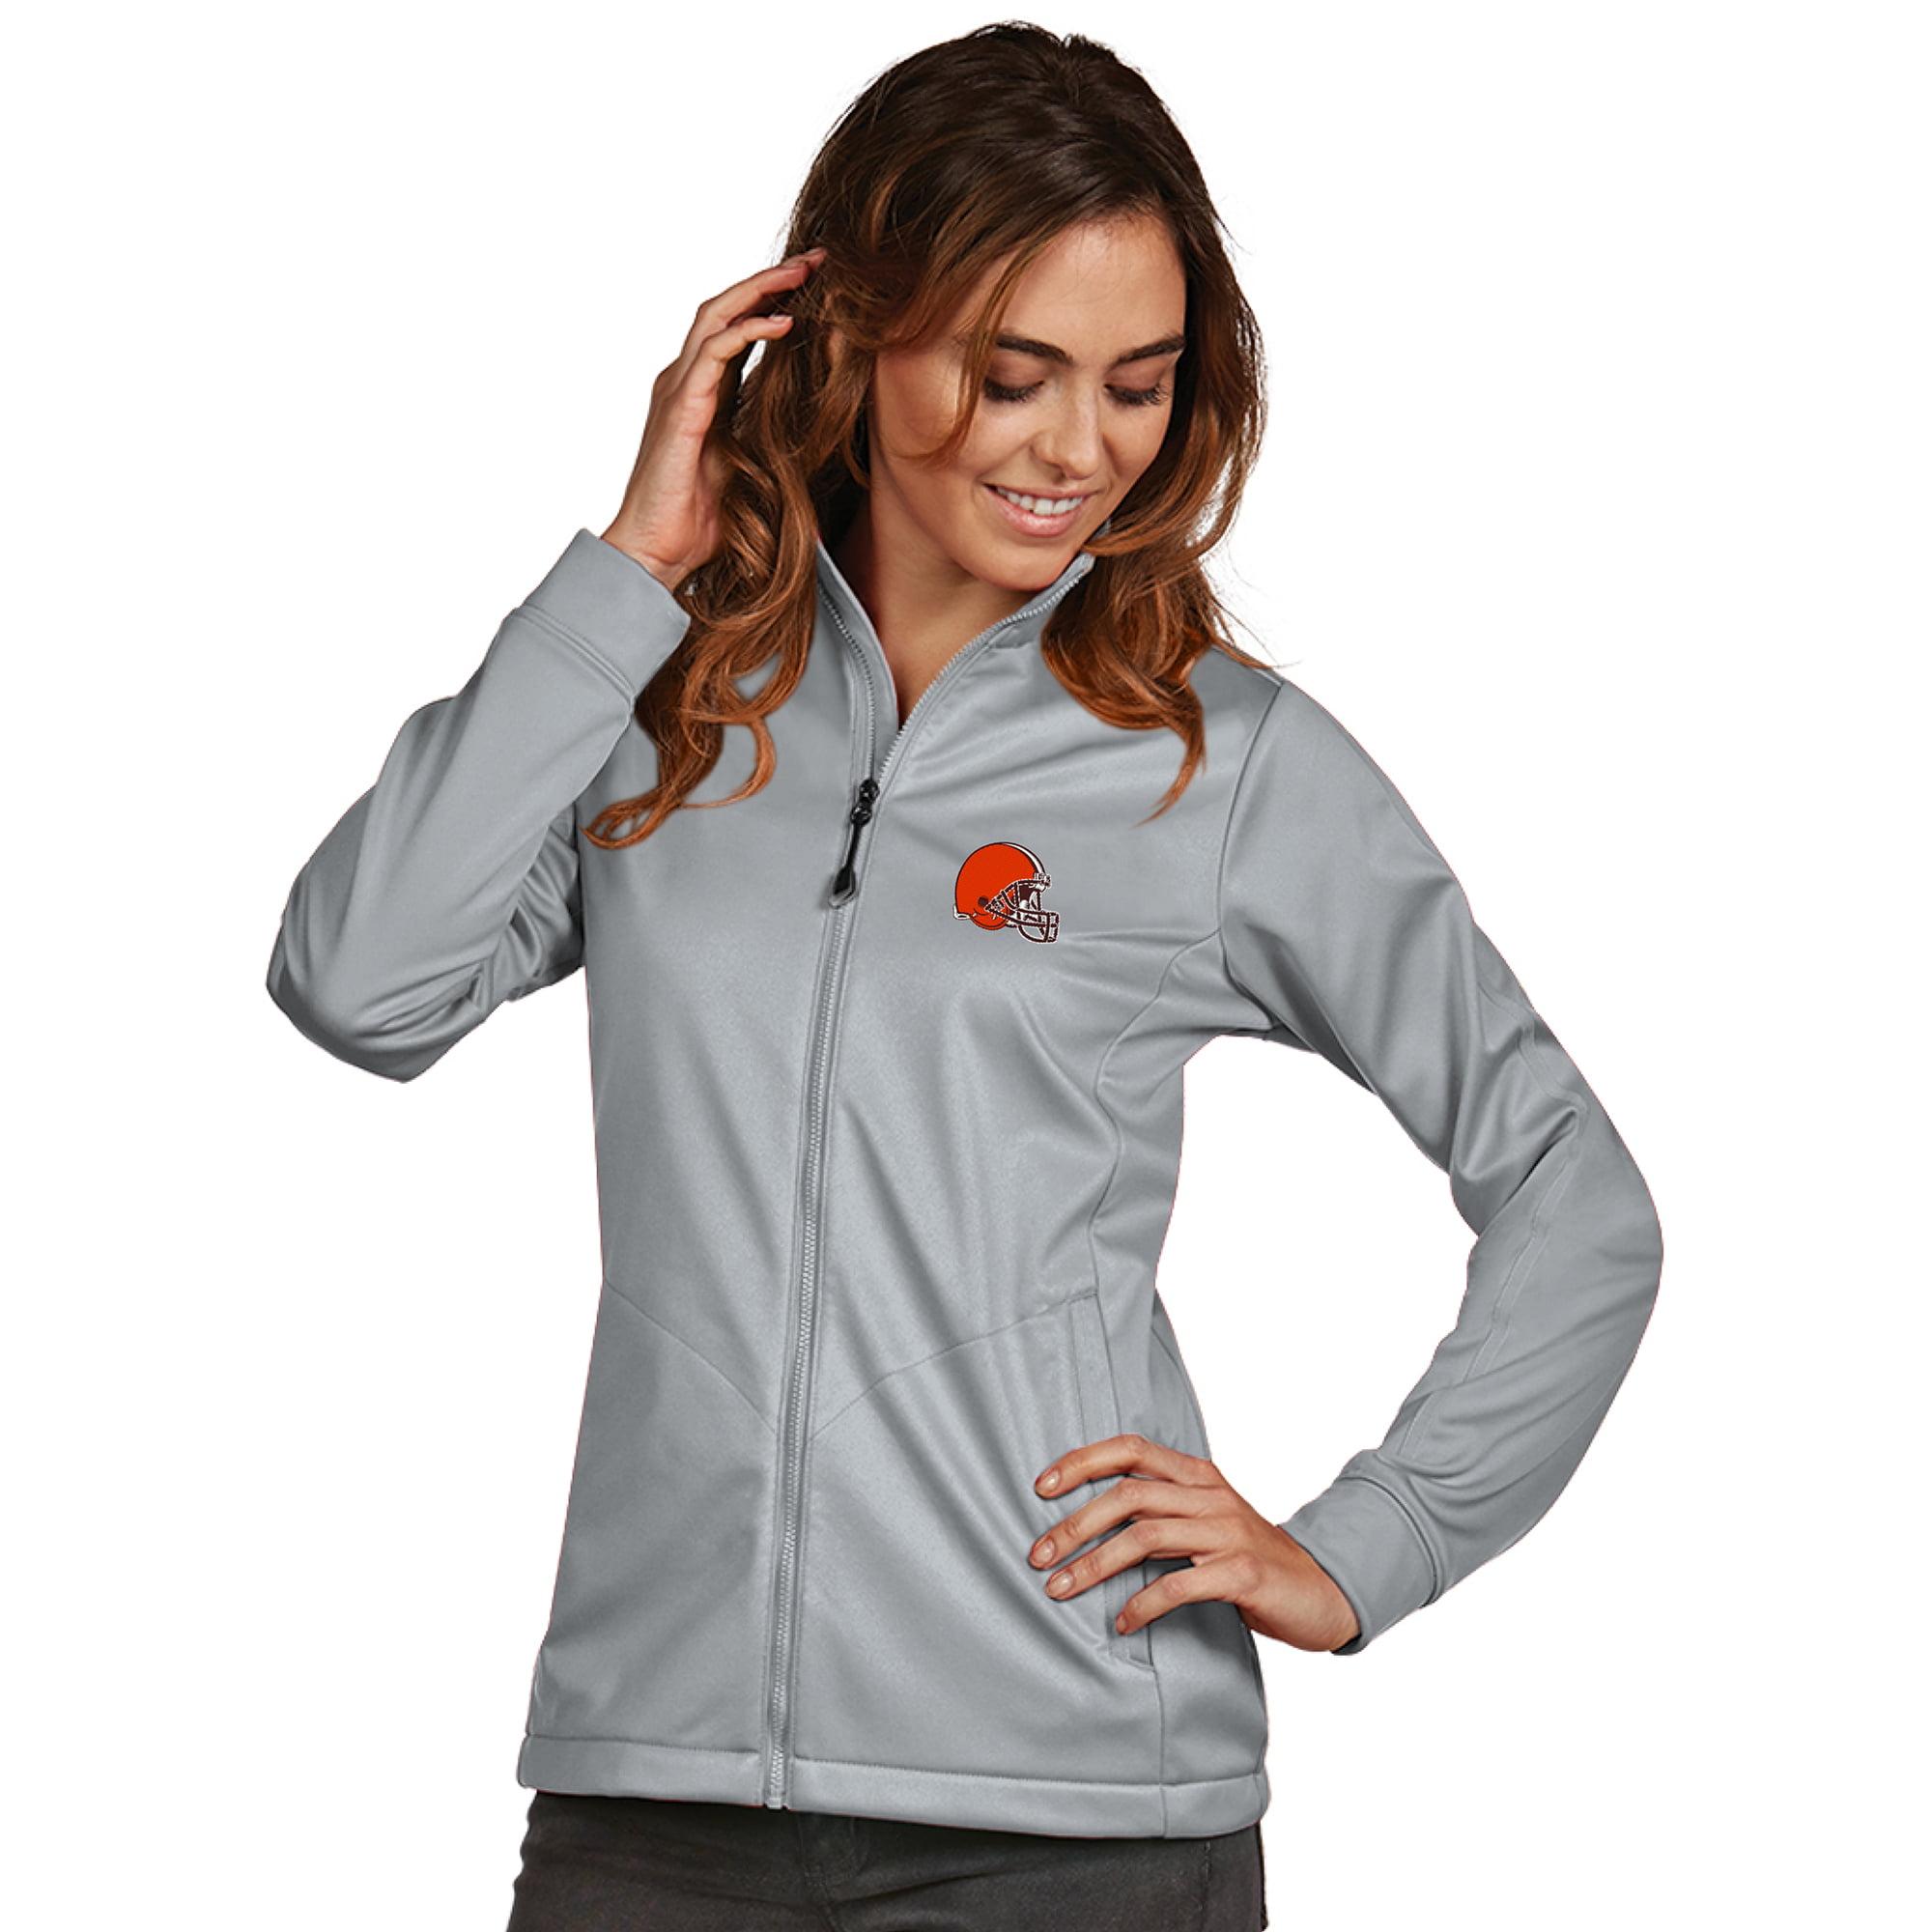 Cleveland Browns Women's Antigua Full-Zip Golf Jacket - Gray